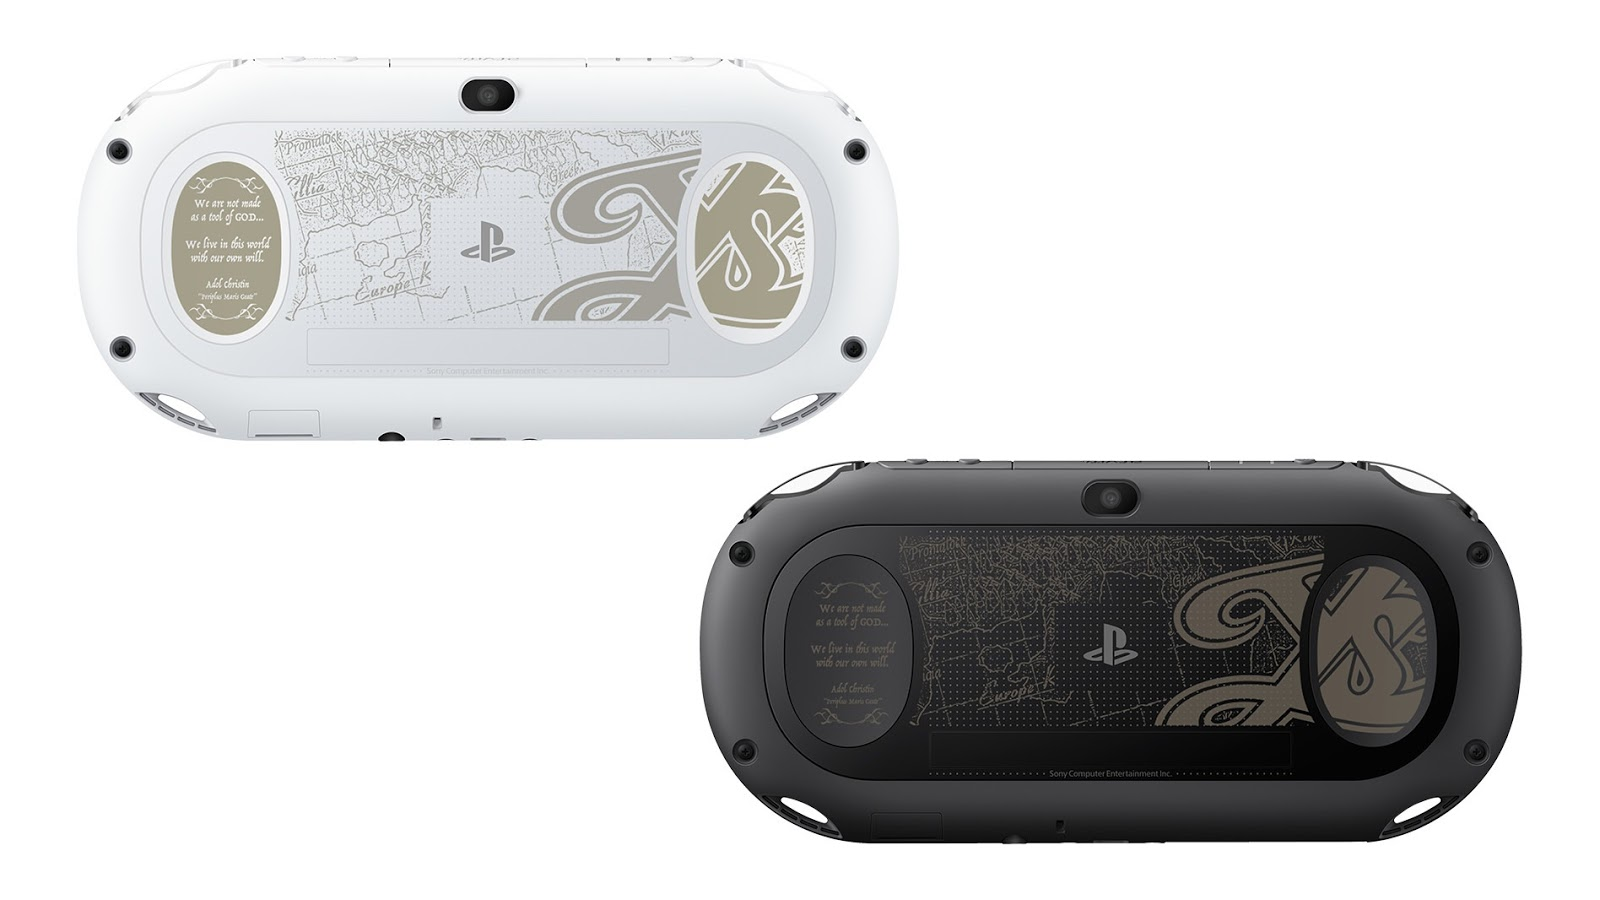 PS Vita Roundup: Ys VIII limited edition Vita looks the business